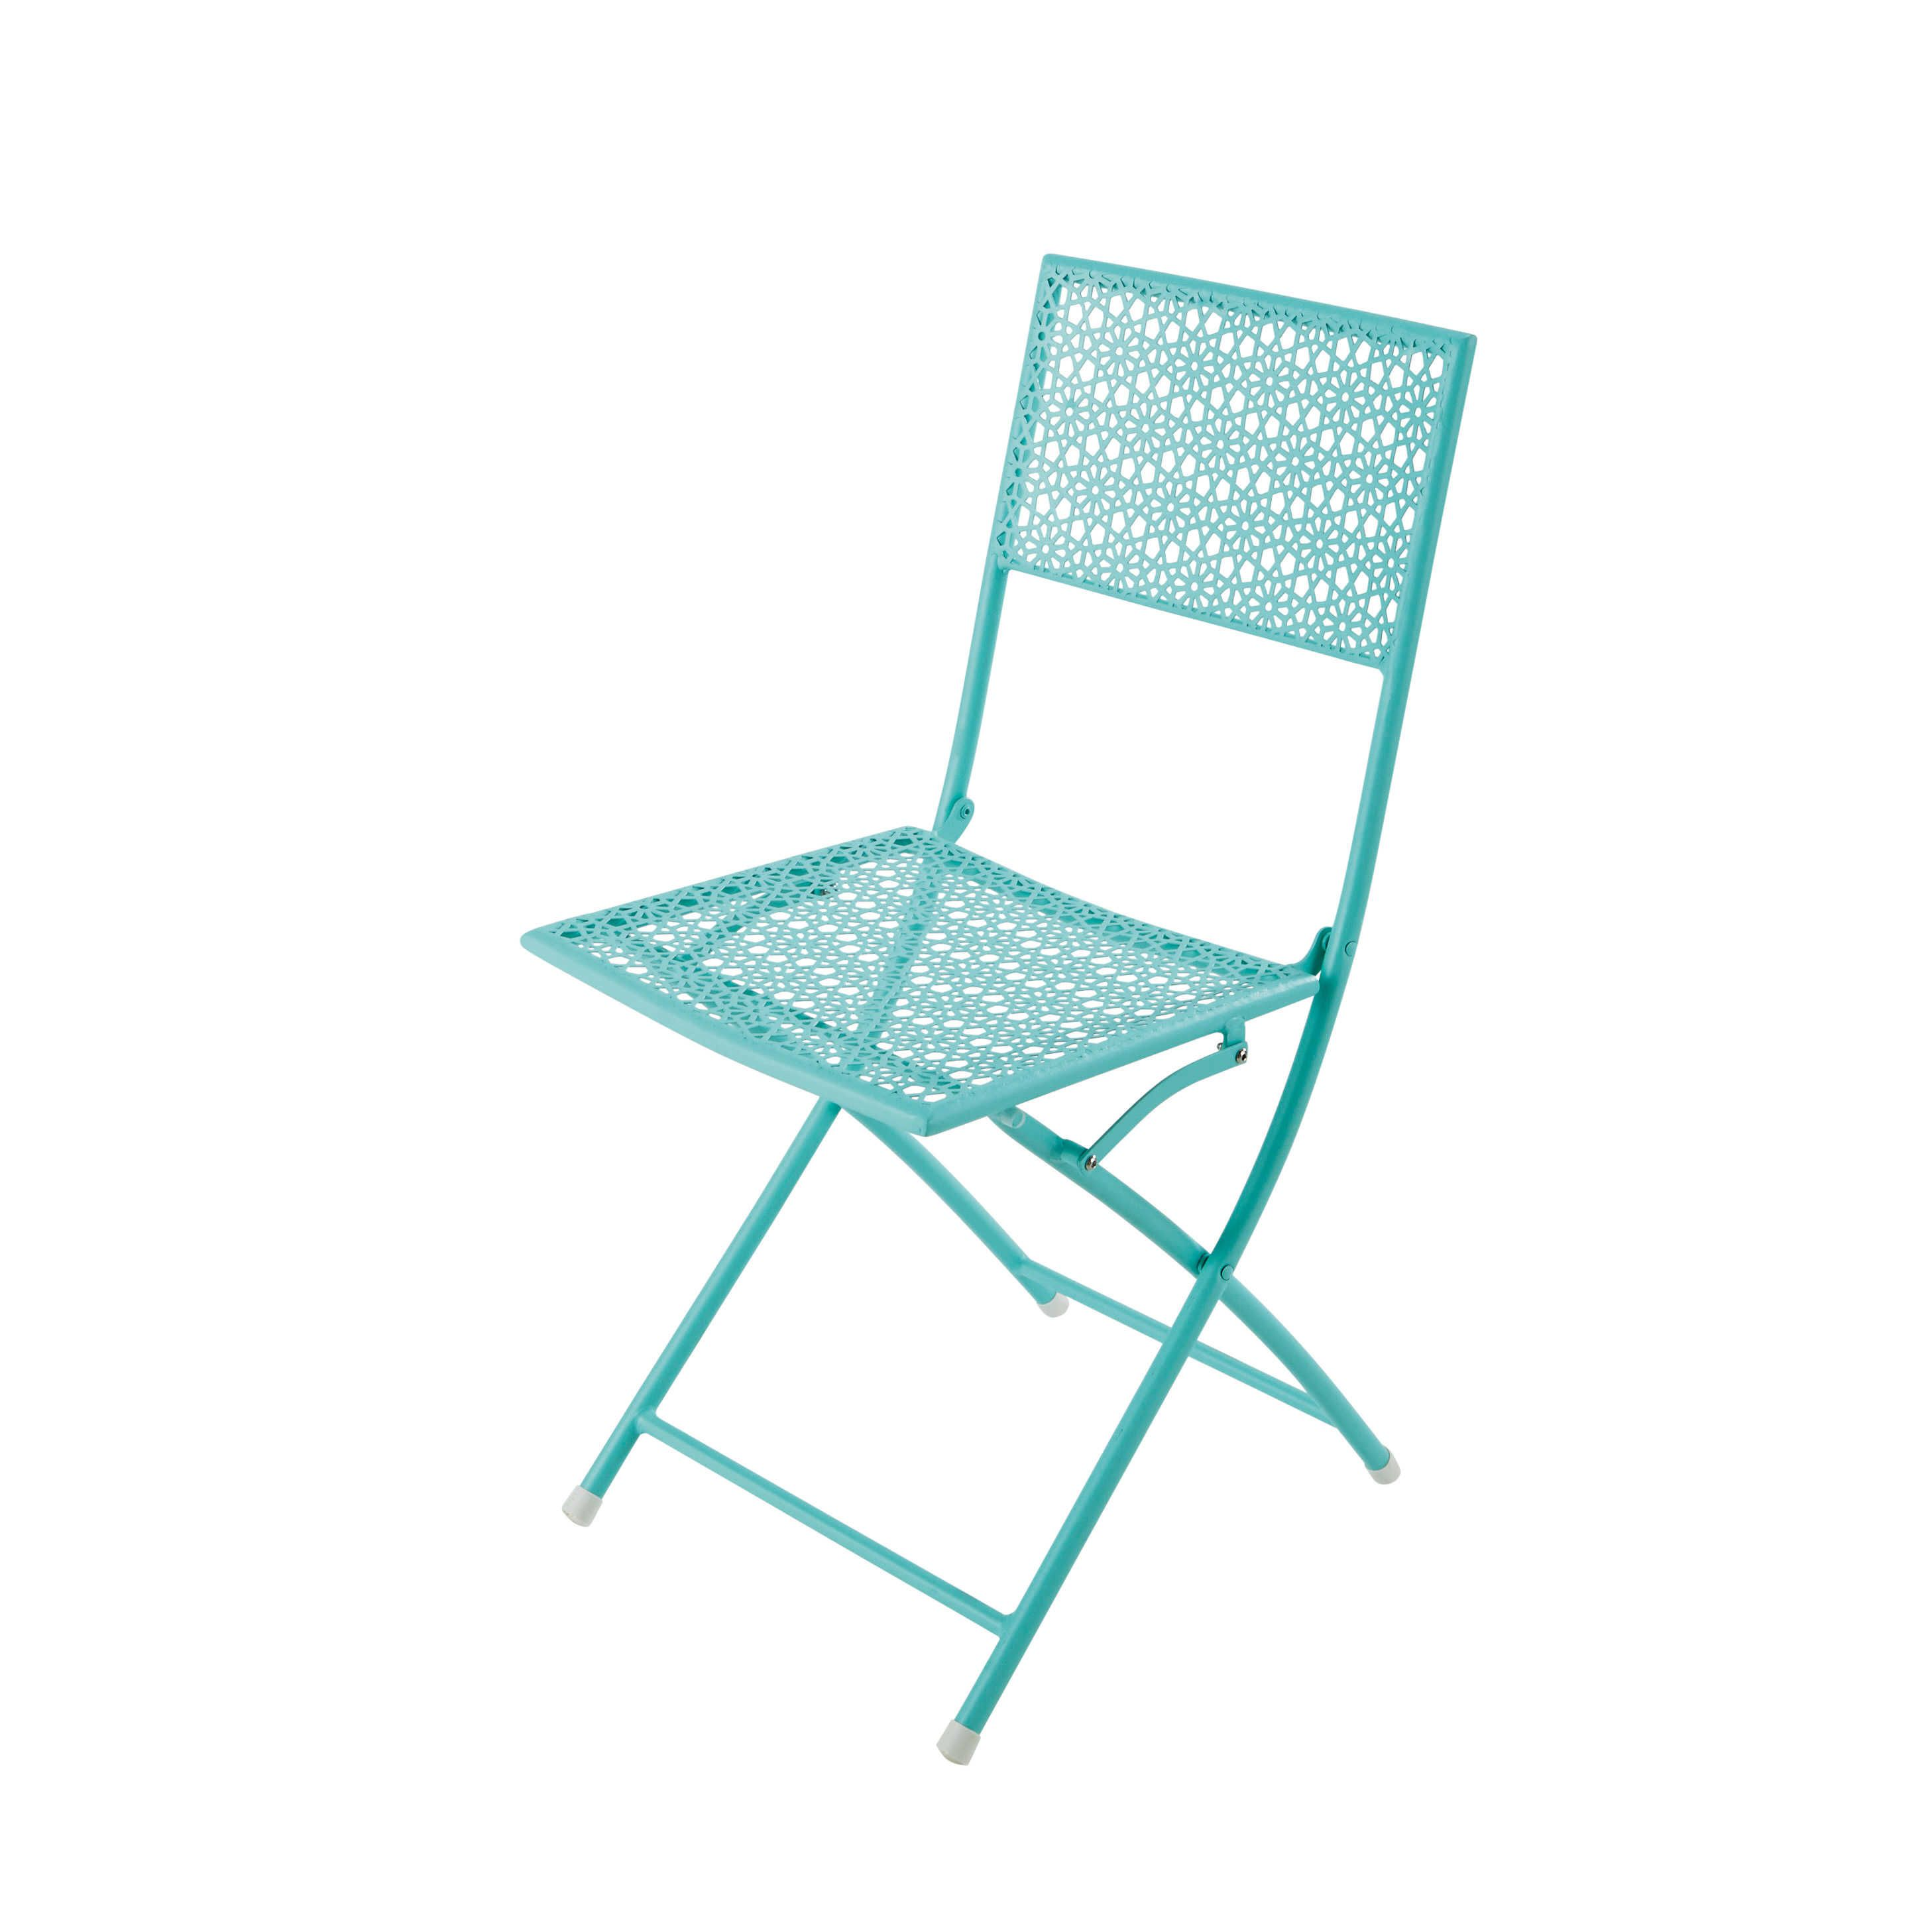 Coin repas | Jardin | Folding garden chairs, Garden chairs, Metal chairs